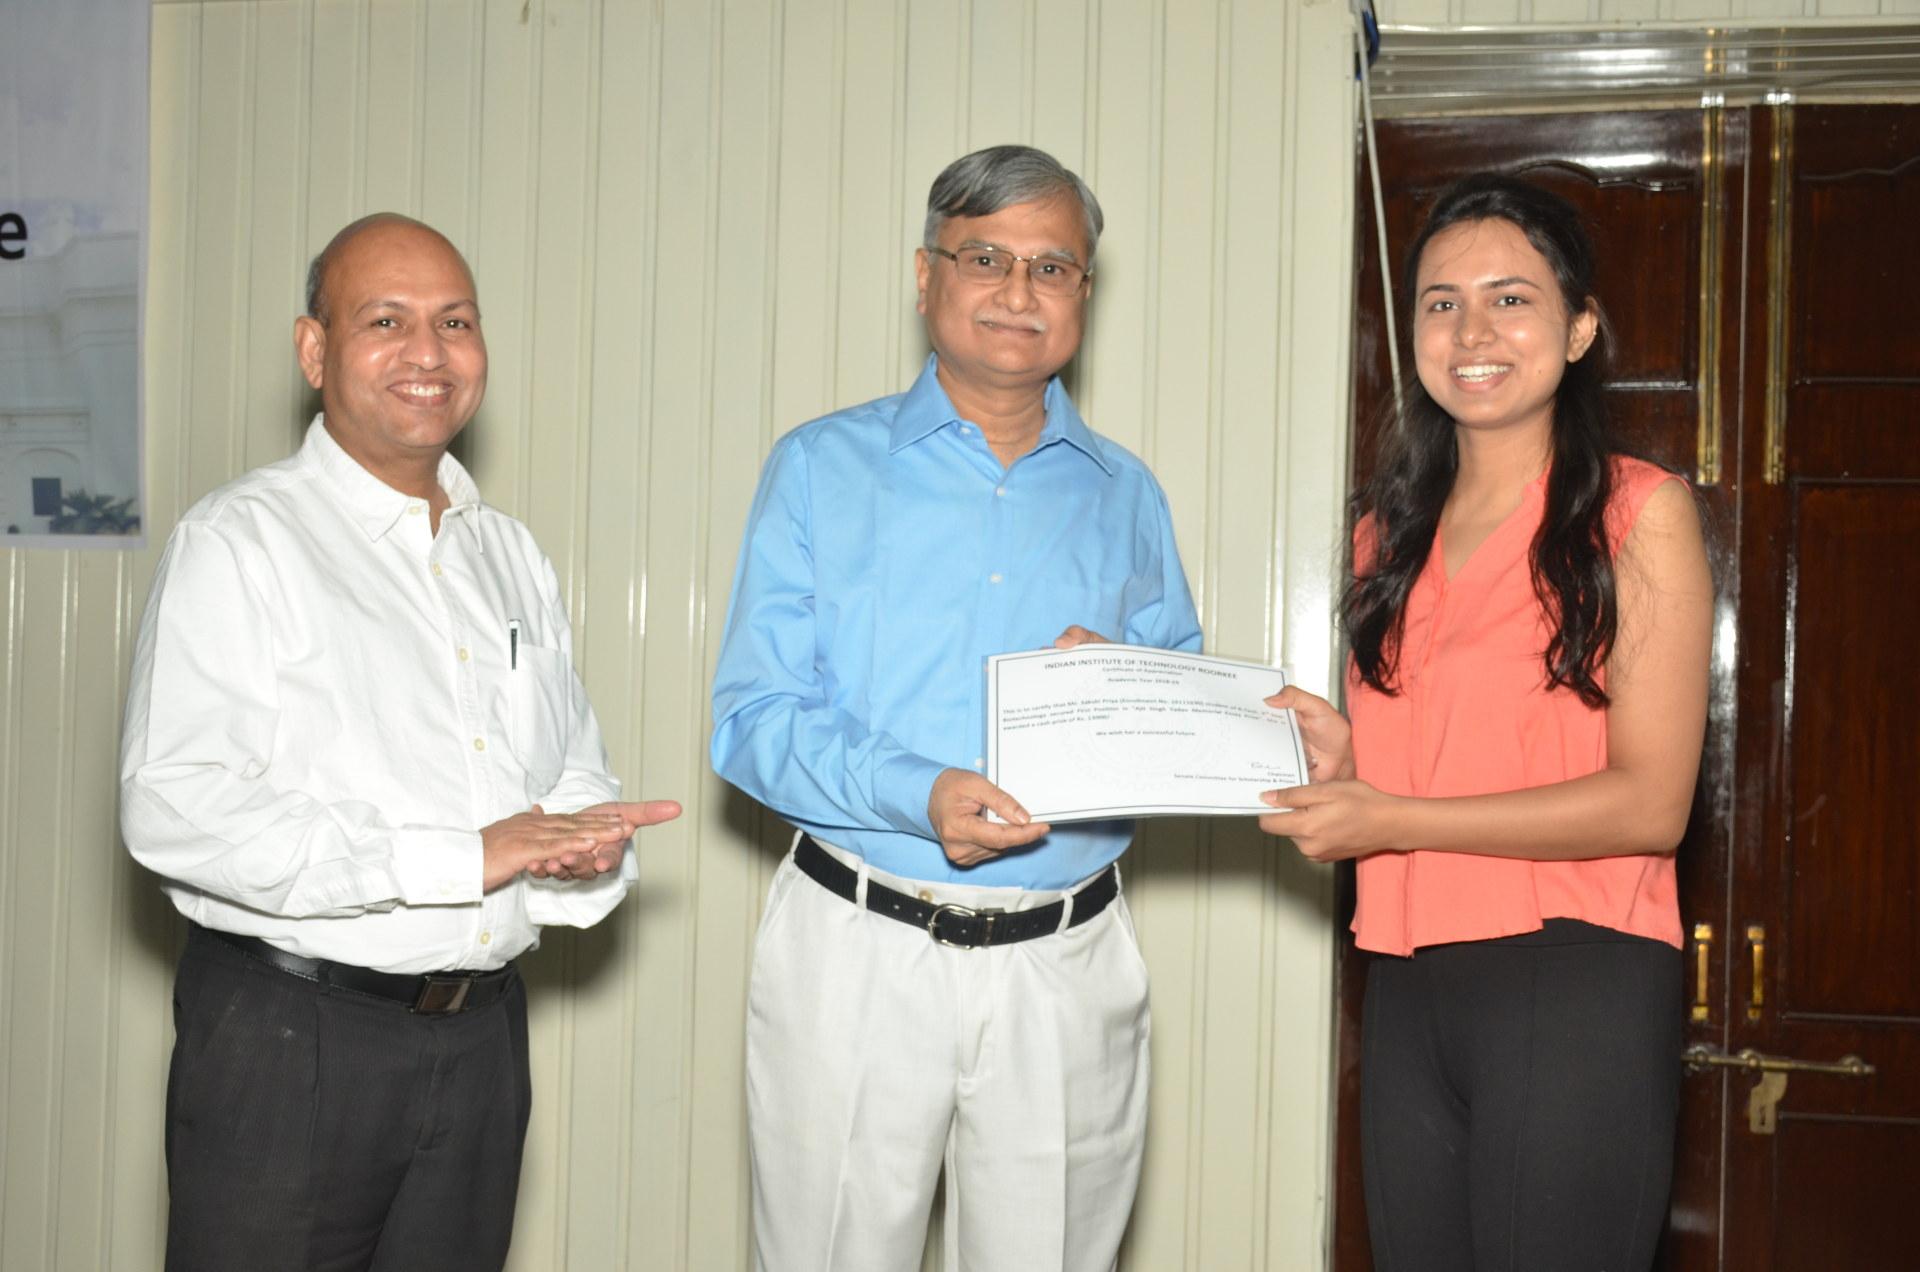 Ajit Singh Yadav Memorial Proficiency Award Recipient Ms. Sakshi Priya